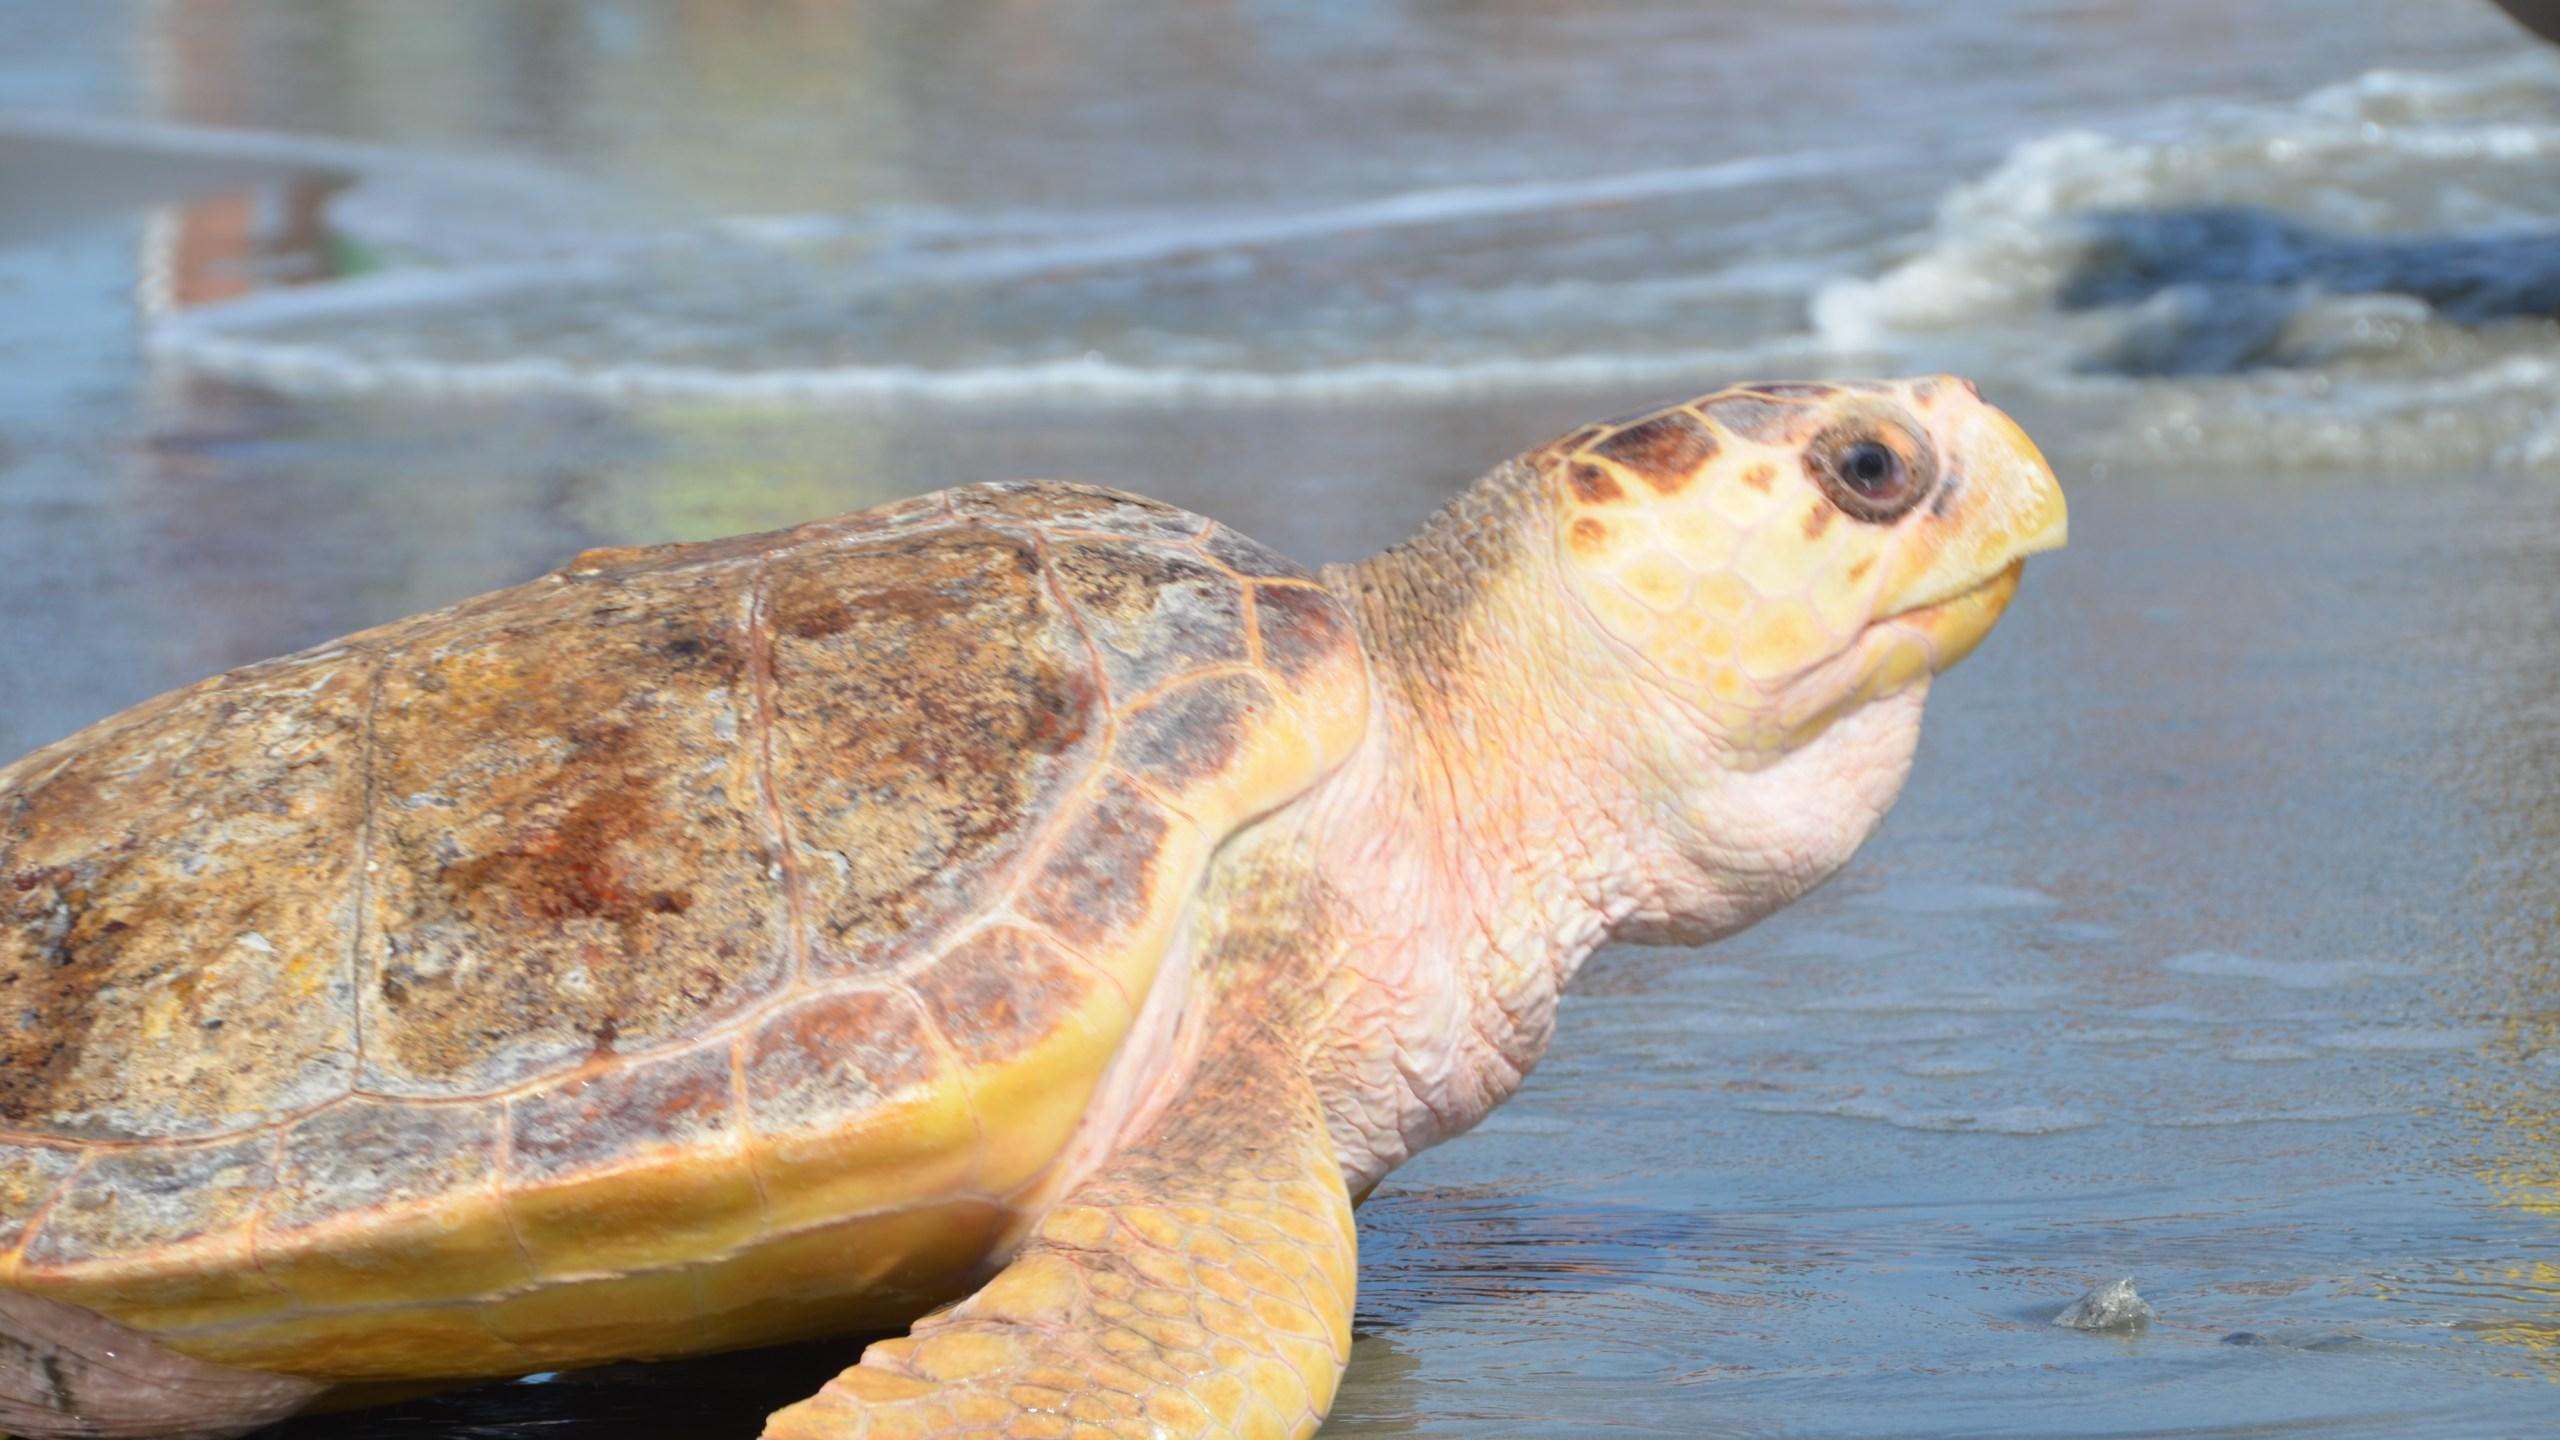 csouth-carolina-aquarium-sea-turtle-care-center-turtle-release-ray-serp-oyster-folly-beach-october-2016-21_241294